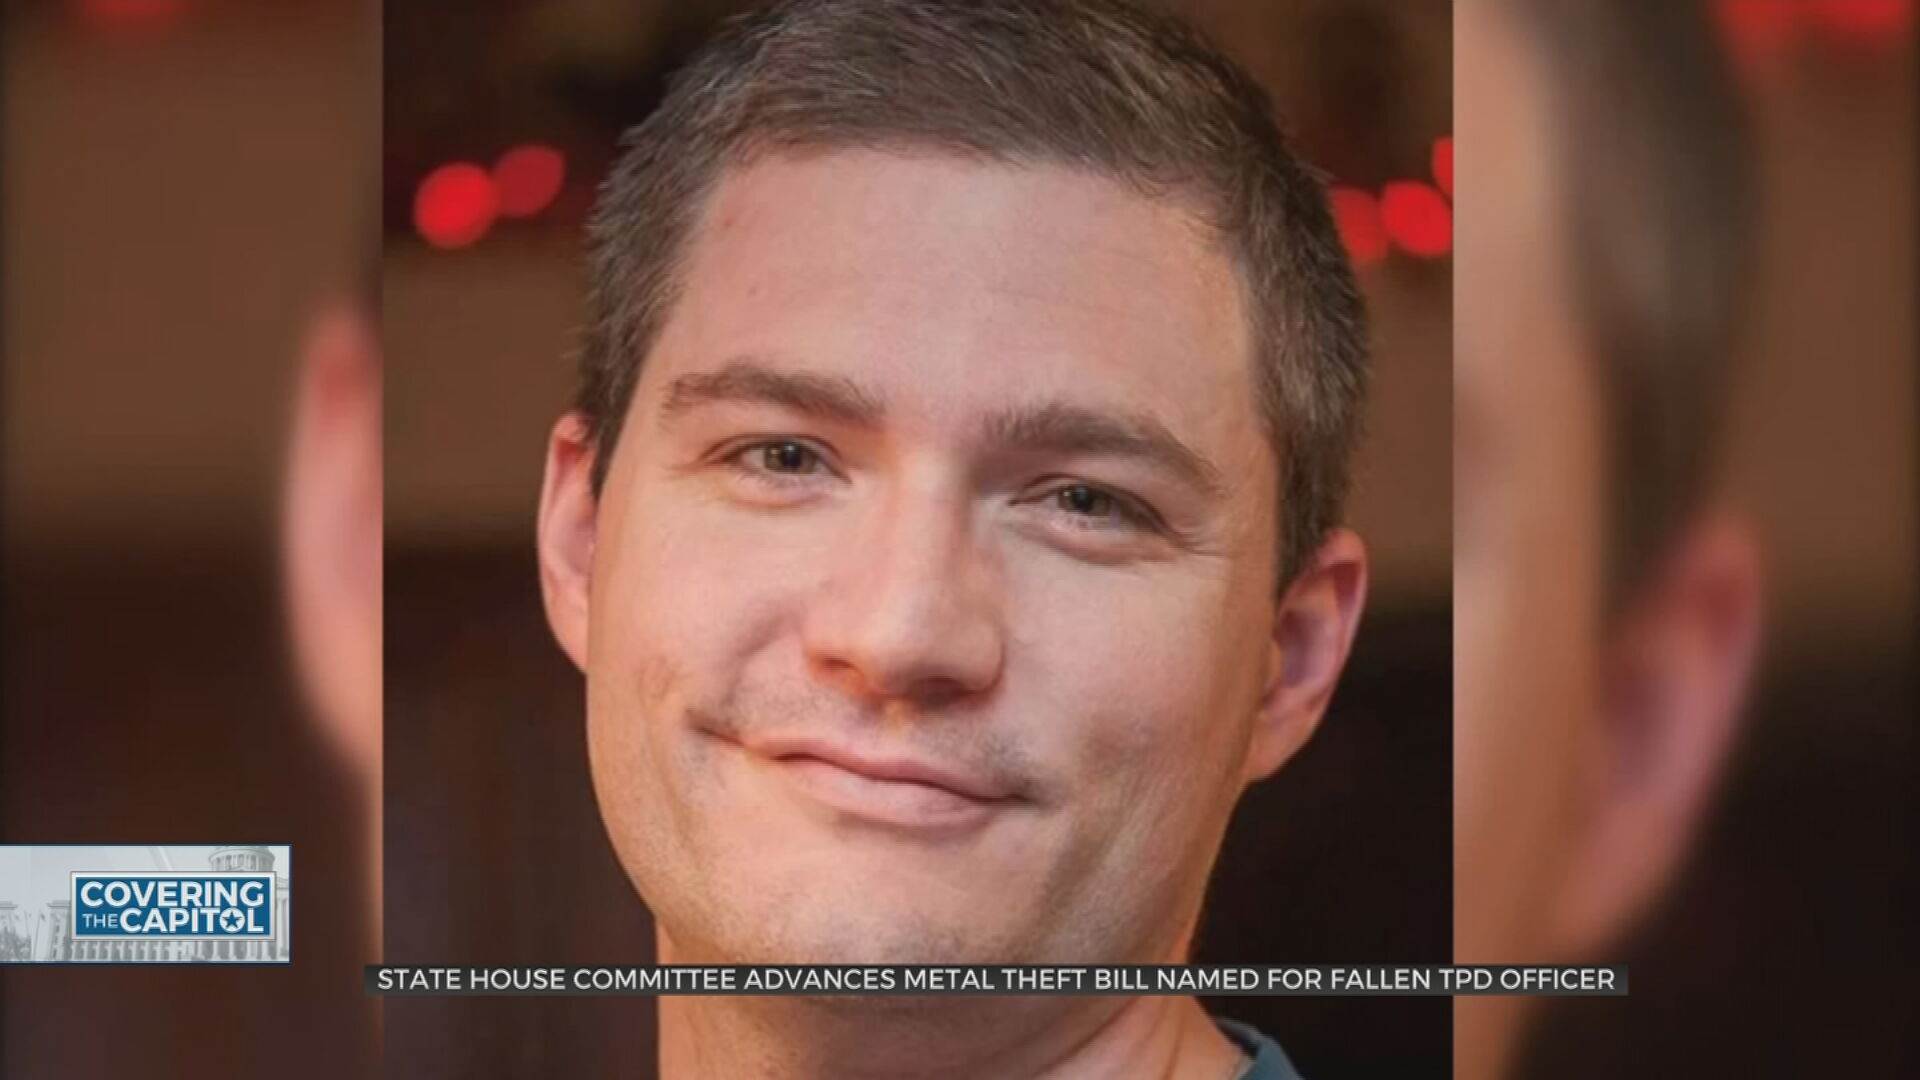 House Committee Advances Copper Theft Bill Honoring Fallen Tulsa Officer